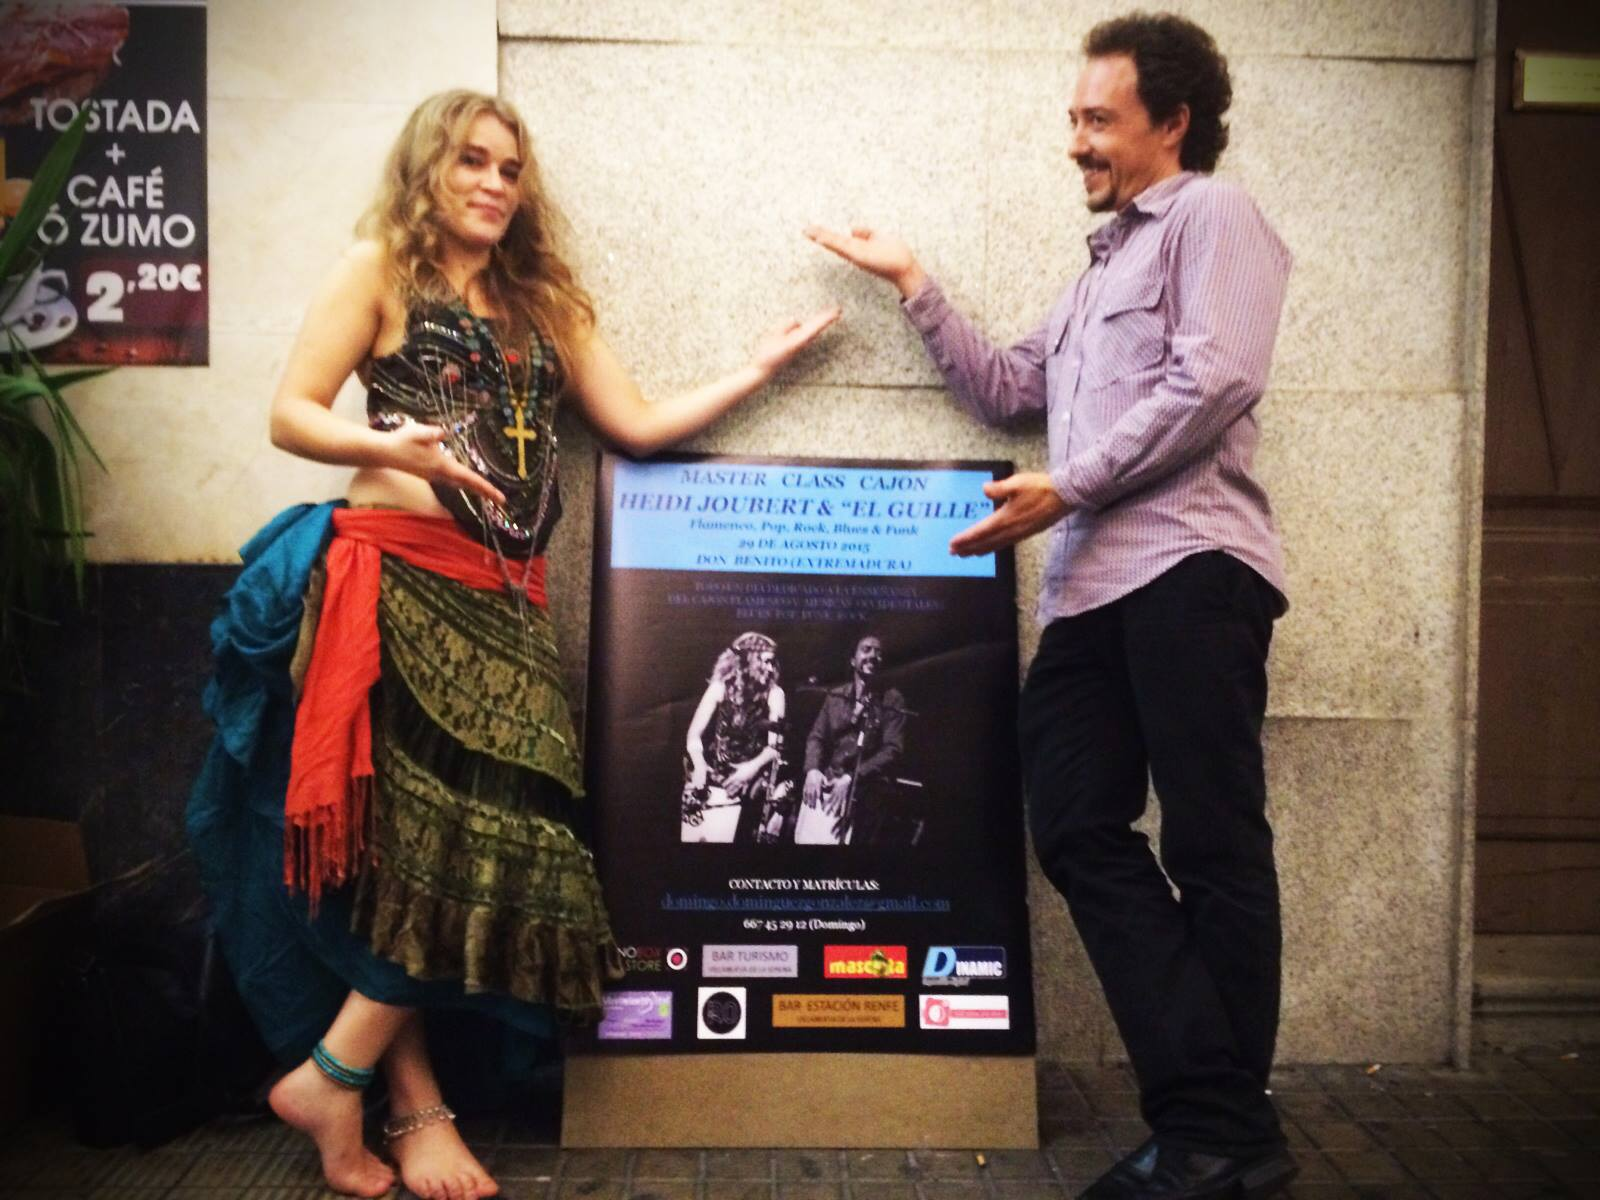 Cajon Duet video – Heidi Joubert & Guillermo Garcia